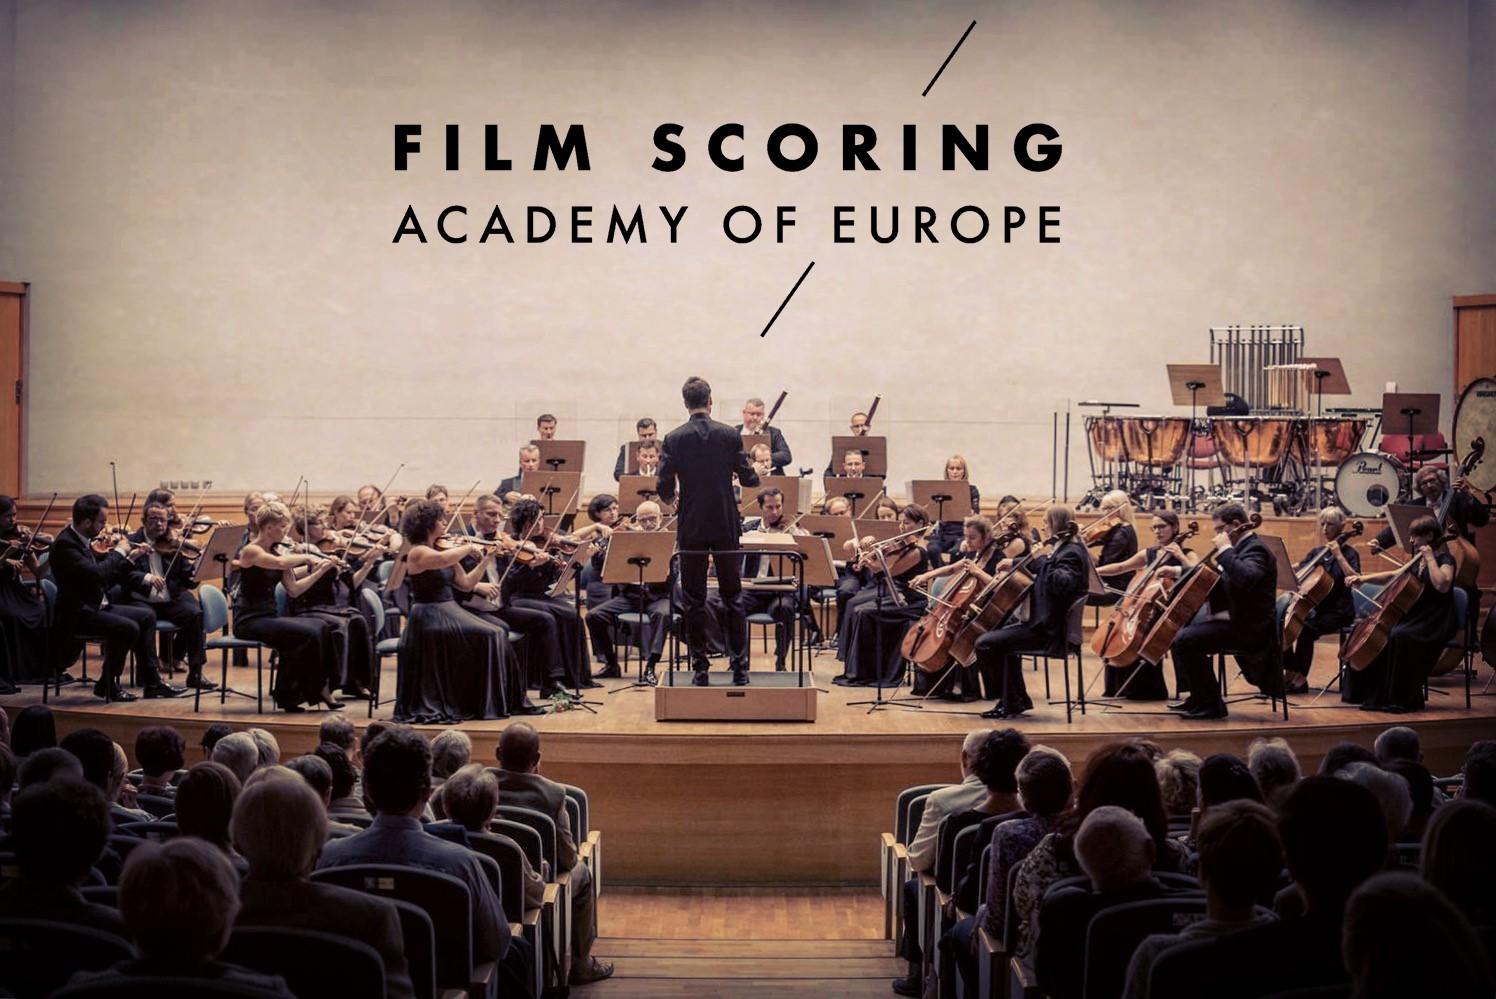 1.Film Scoring Academy